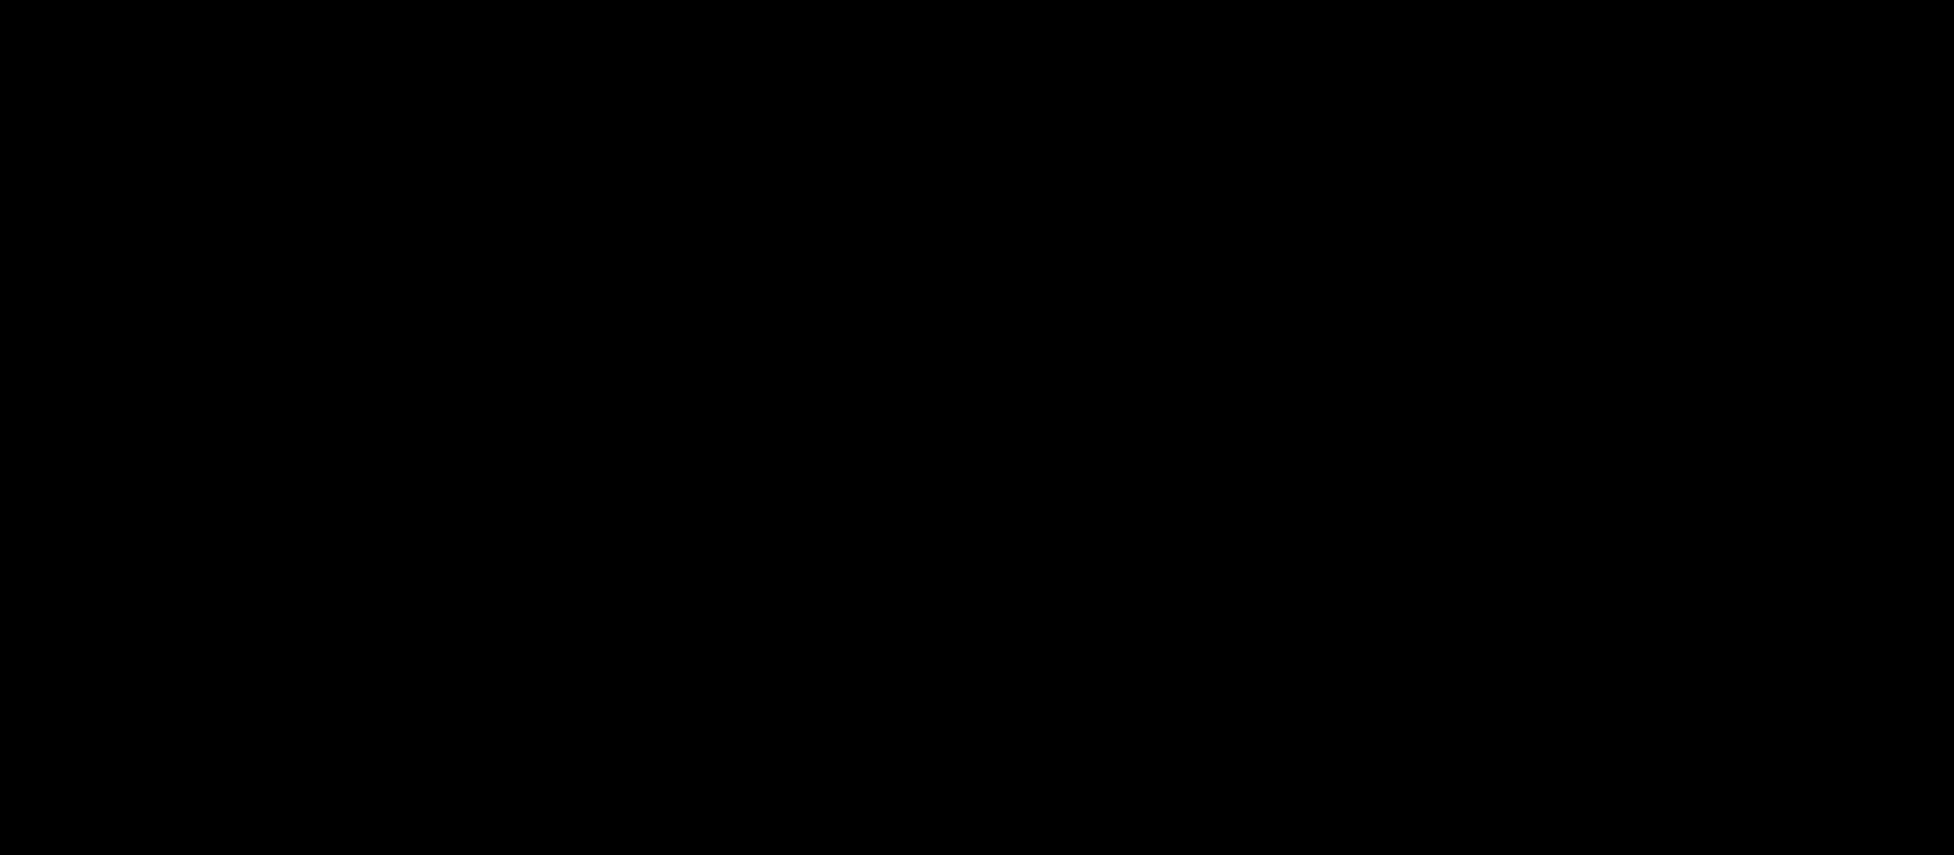 Figure 3: A block diagram representation of a standard negative feedback  loop.